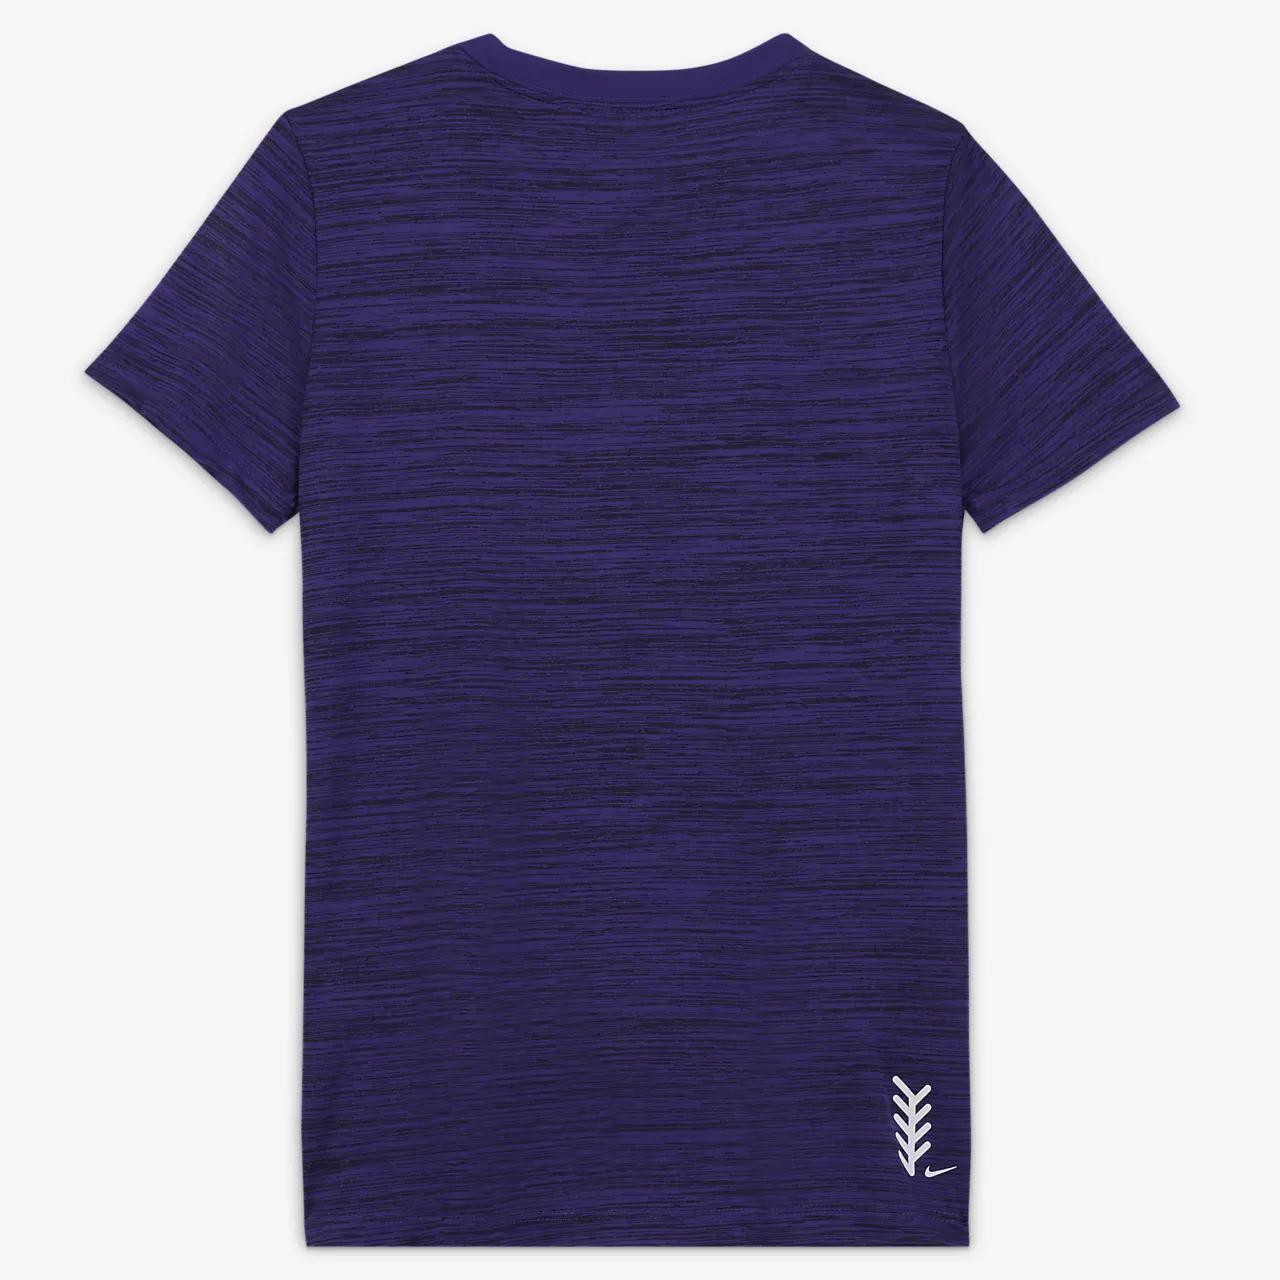 Nike Women's Softball T-Shirt CZ8441-547